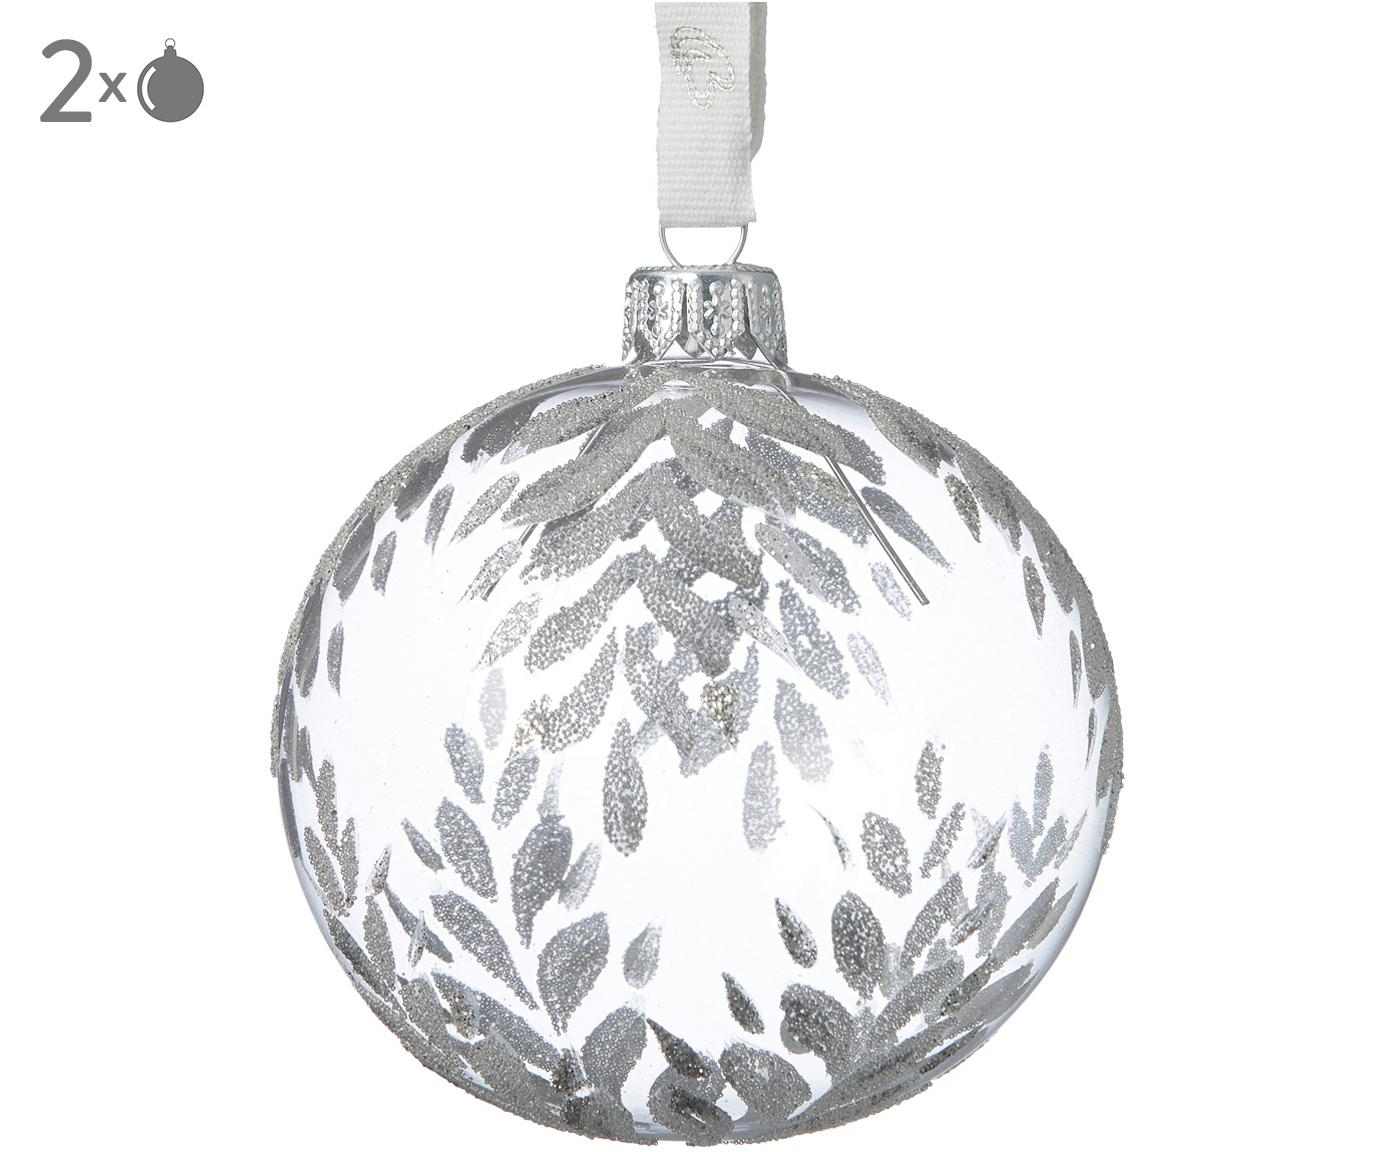 Weihnachtskugeln Cadelia, 2 Stück, Transparent, Silberfarben, Ø 8 x H 8 cm